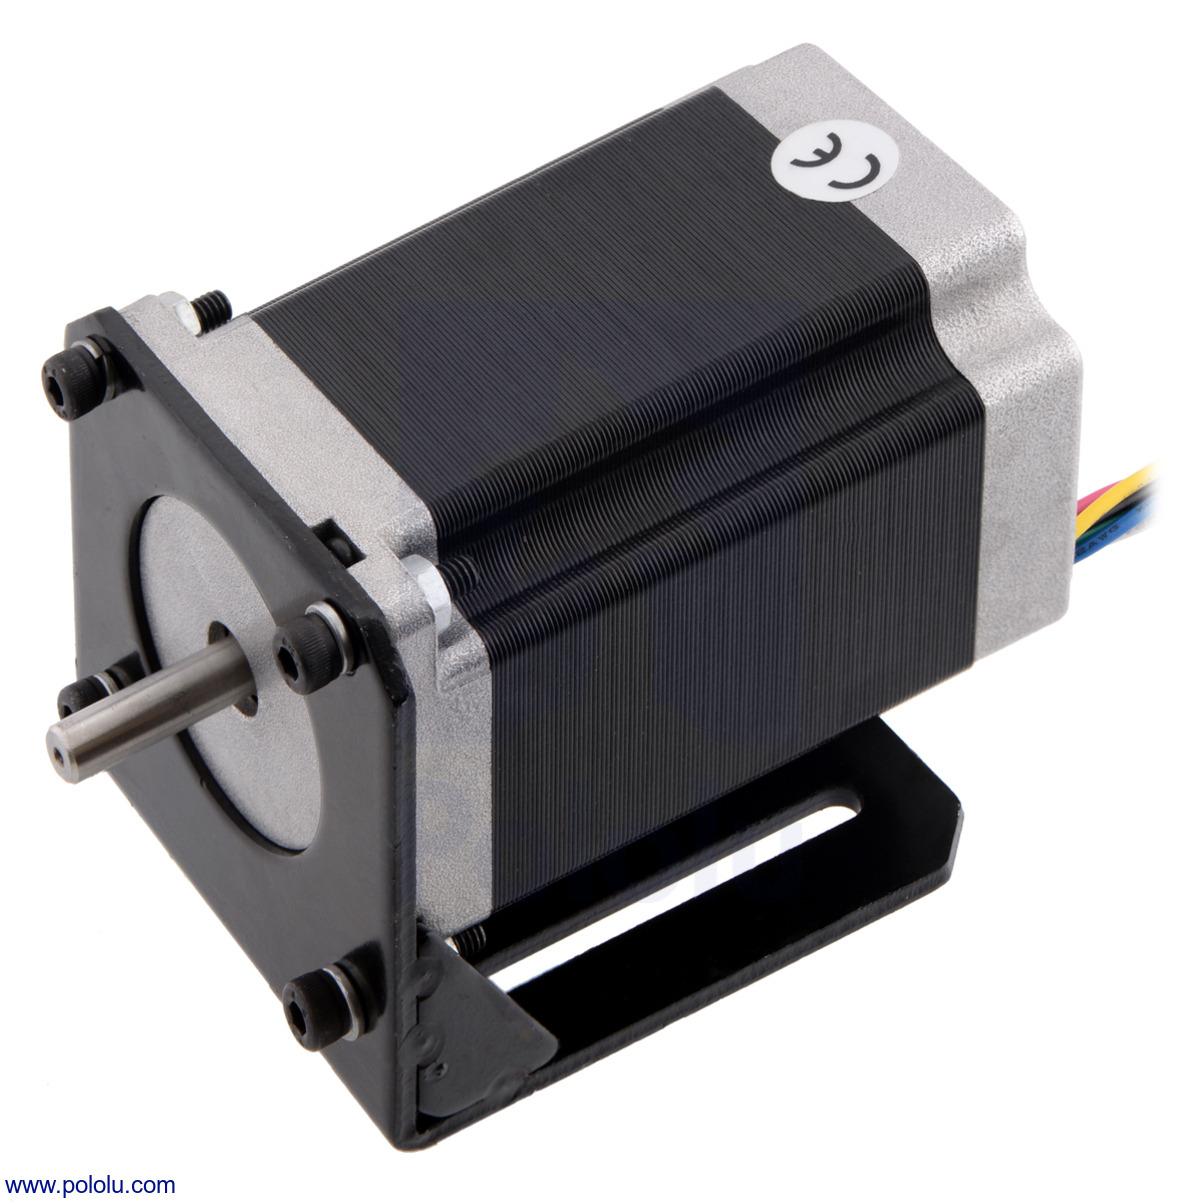 nema 23 stepper motor item 1475 mounted with a steel l bracket for nema 23 stepper motors  [ 1200 x 1204 Pixel ]